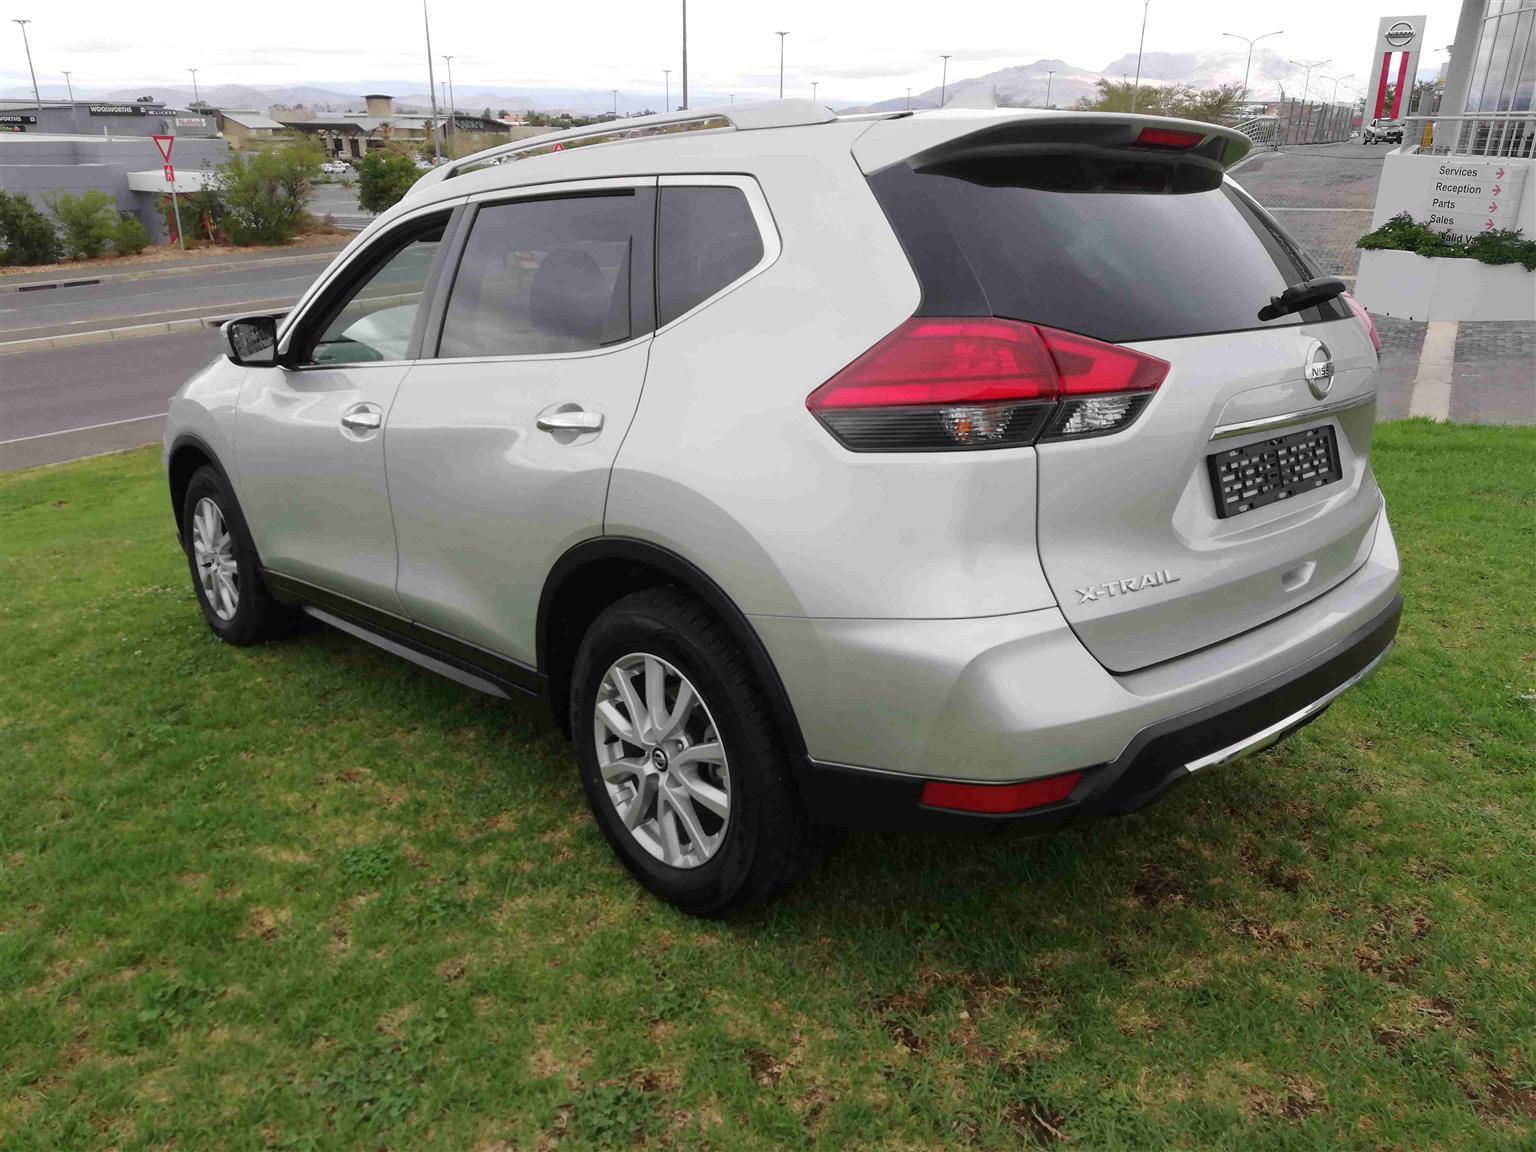 2018 Nissan X-Trail 2.5 4x4 SE CVT